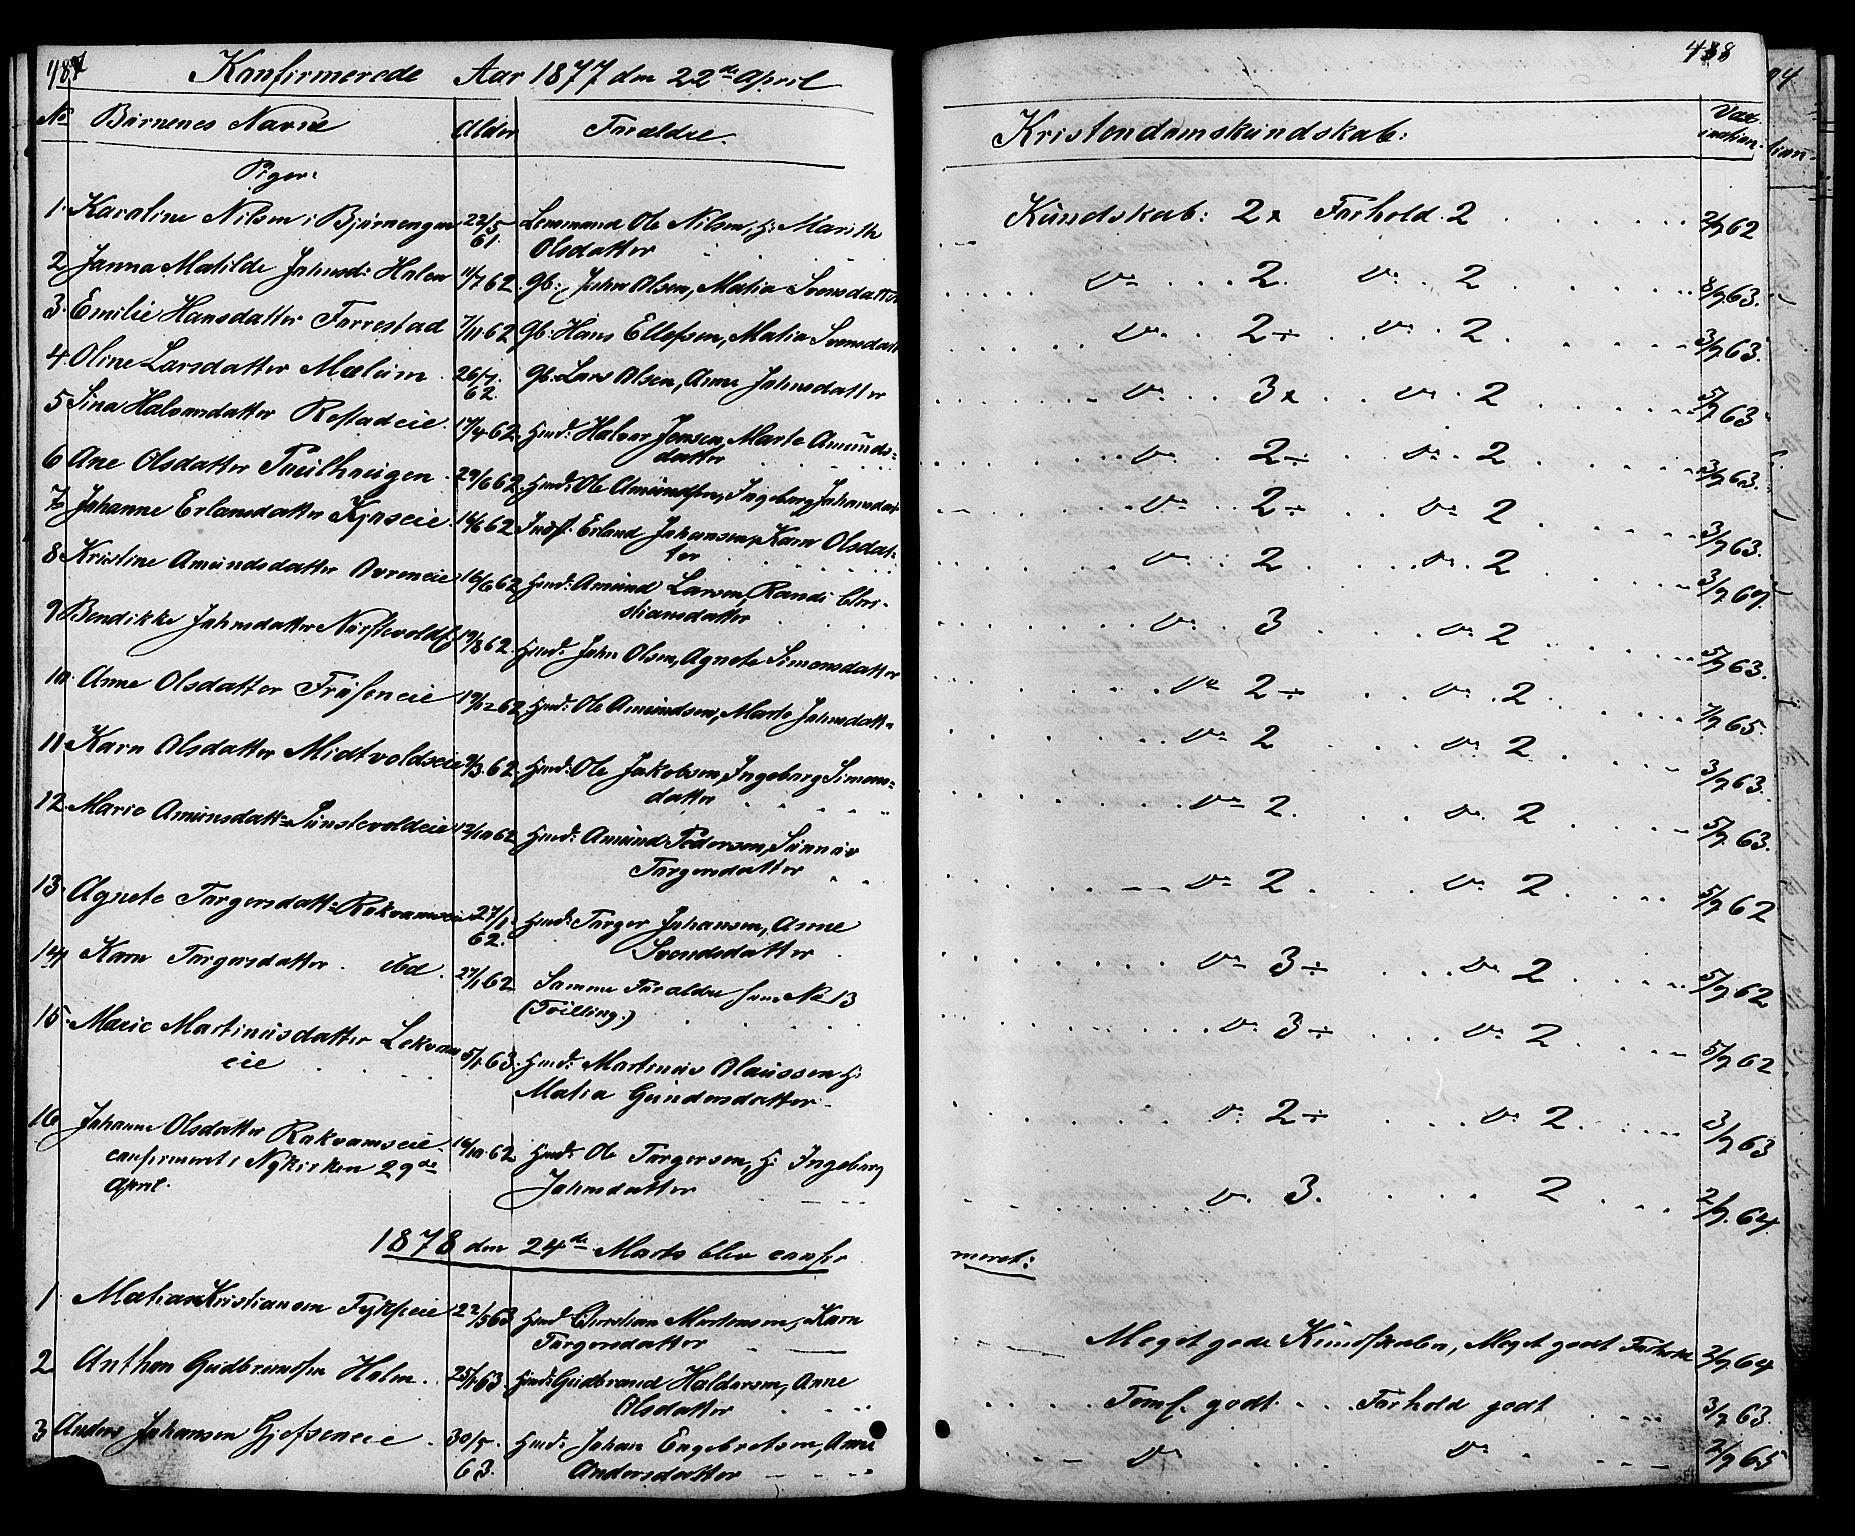 SAH, Østre Gausdal prestekontor, Klokkerbok nr. 1, 1863-1893, s. 487-488